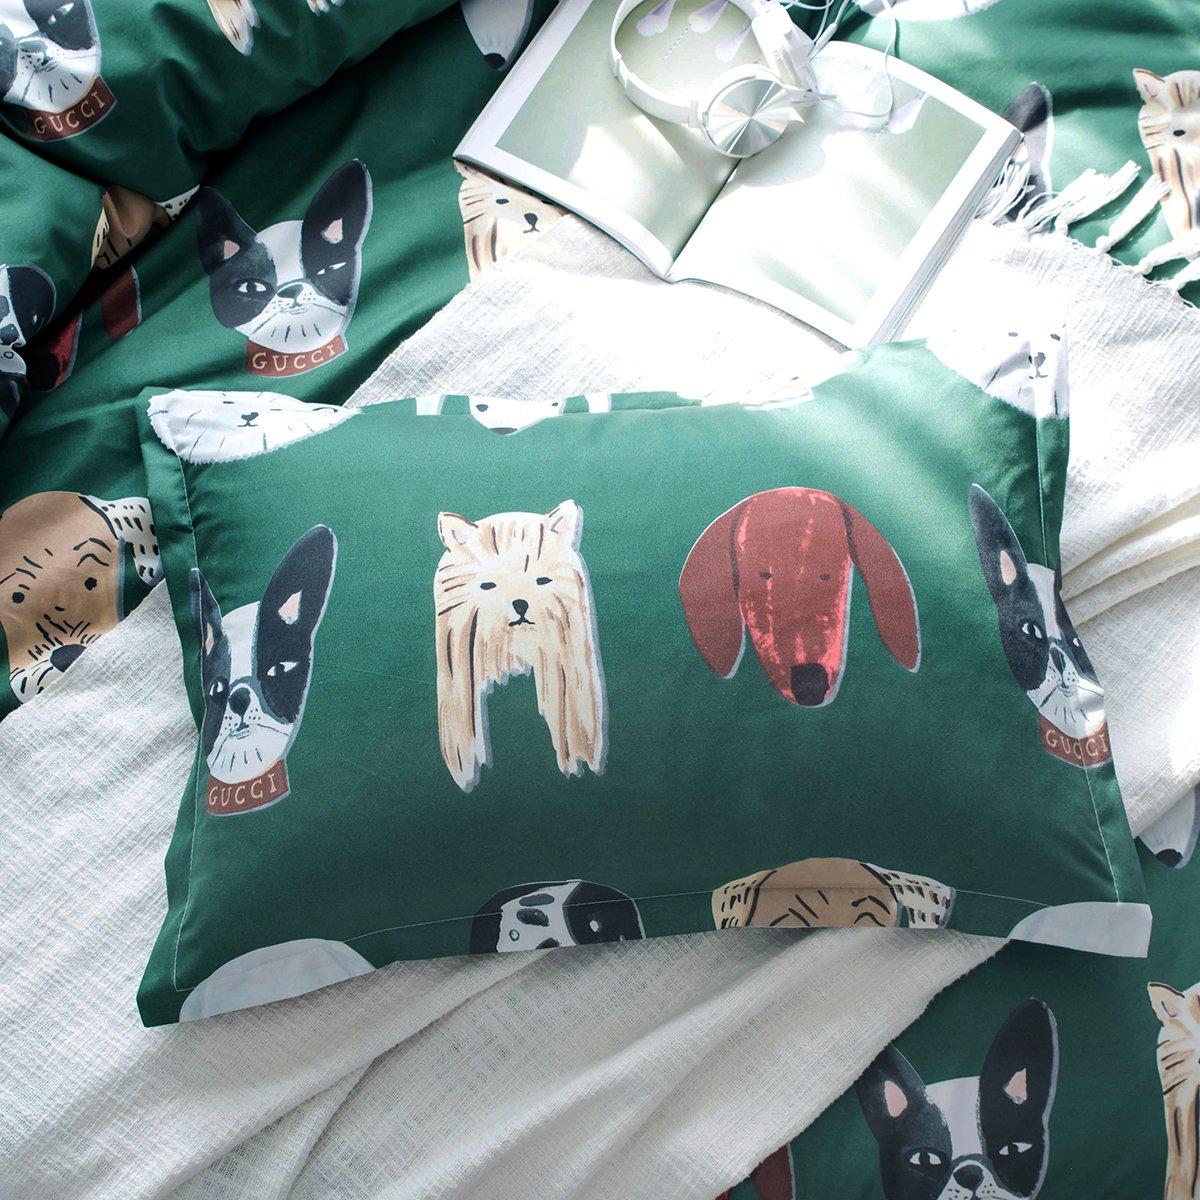 Breathable GOOFUN-B1K 3 Piece Duvet Cover Bedding Set Lightweight Microfiber 1 Duvet Cover 2 Pillow Shams Comfortable Soft King Size SQXR-2K